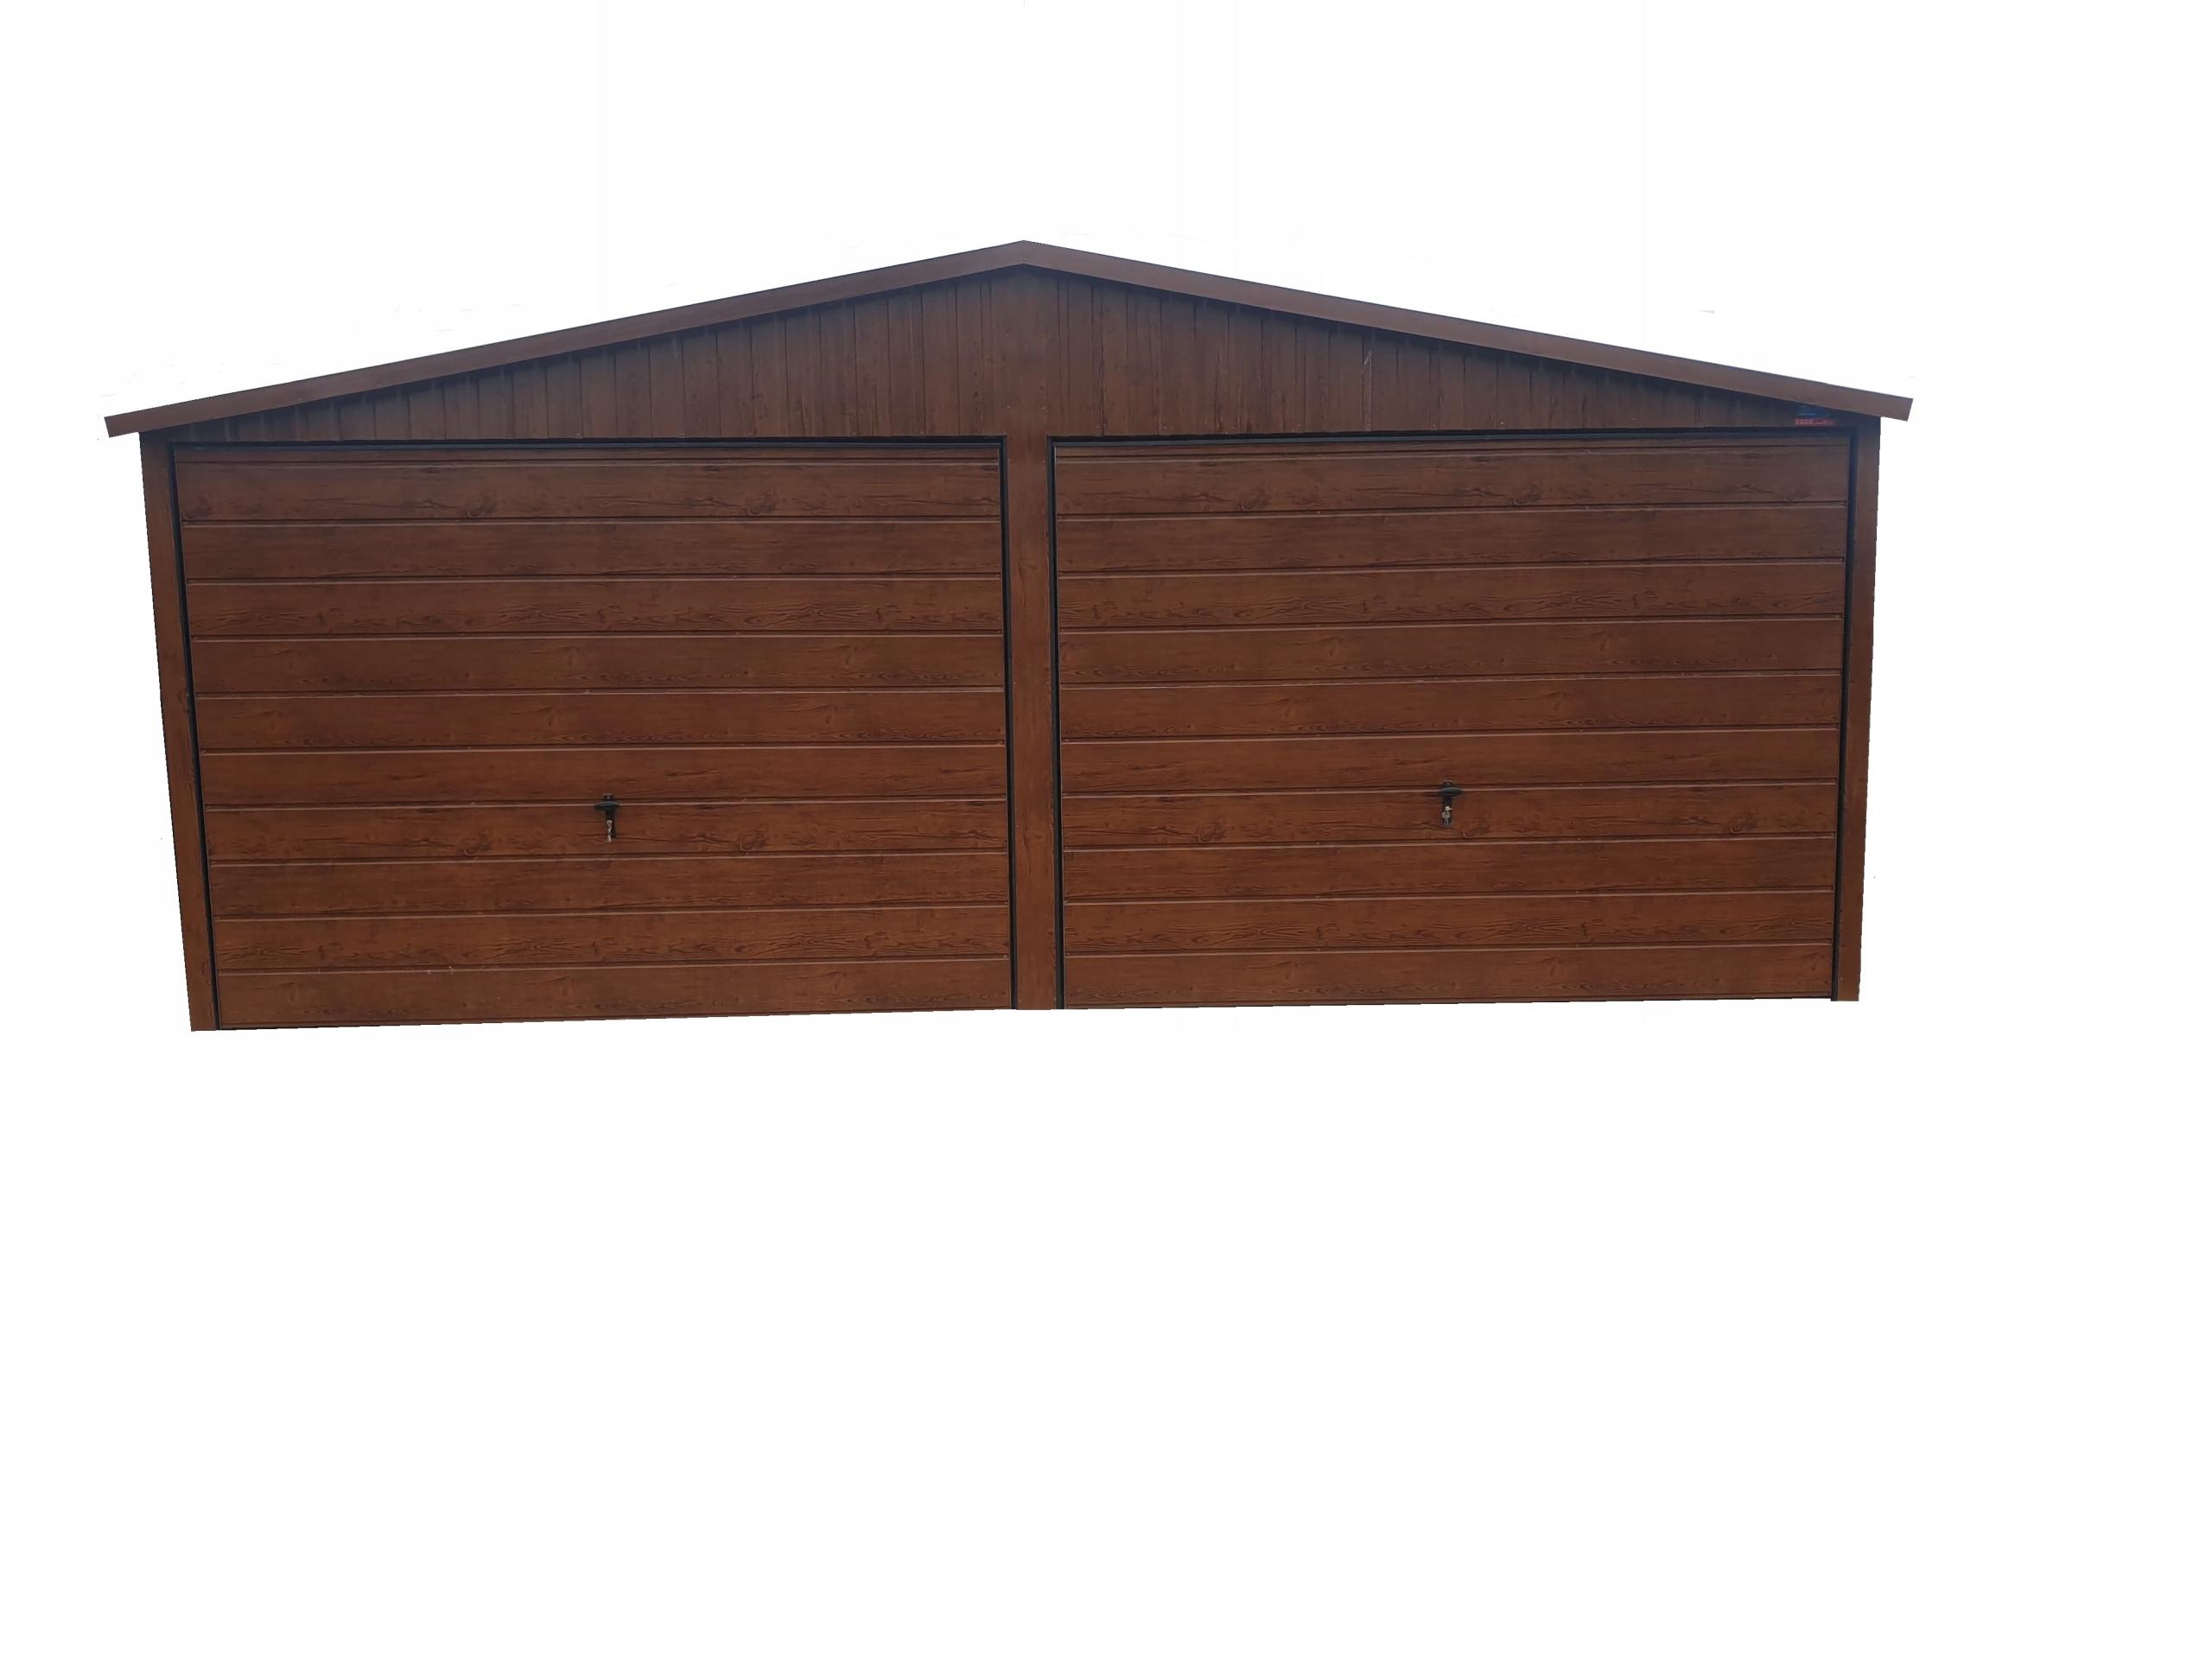 garaż blaszany 6x5 garaze blaszane RYBNIK